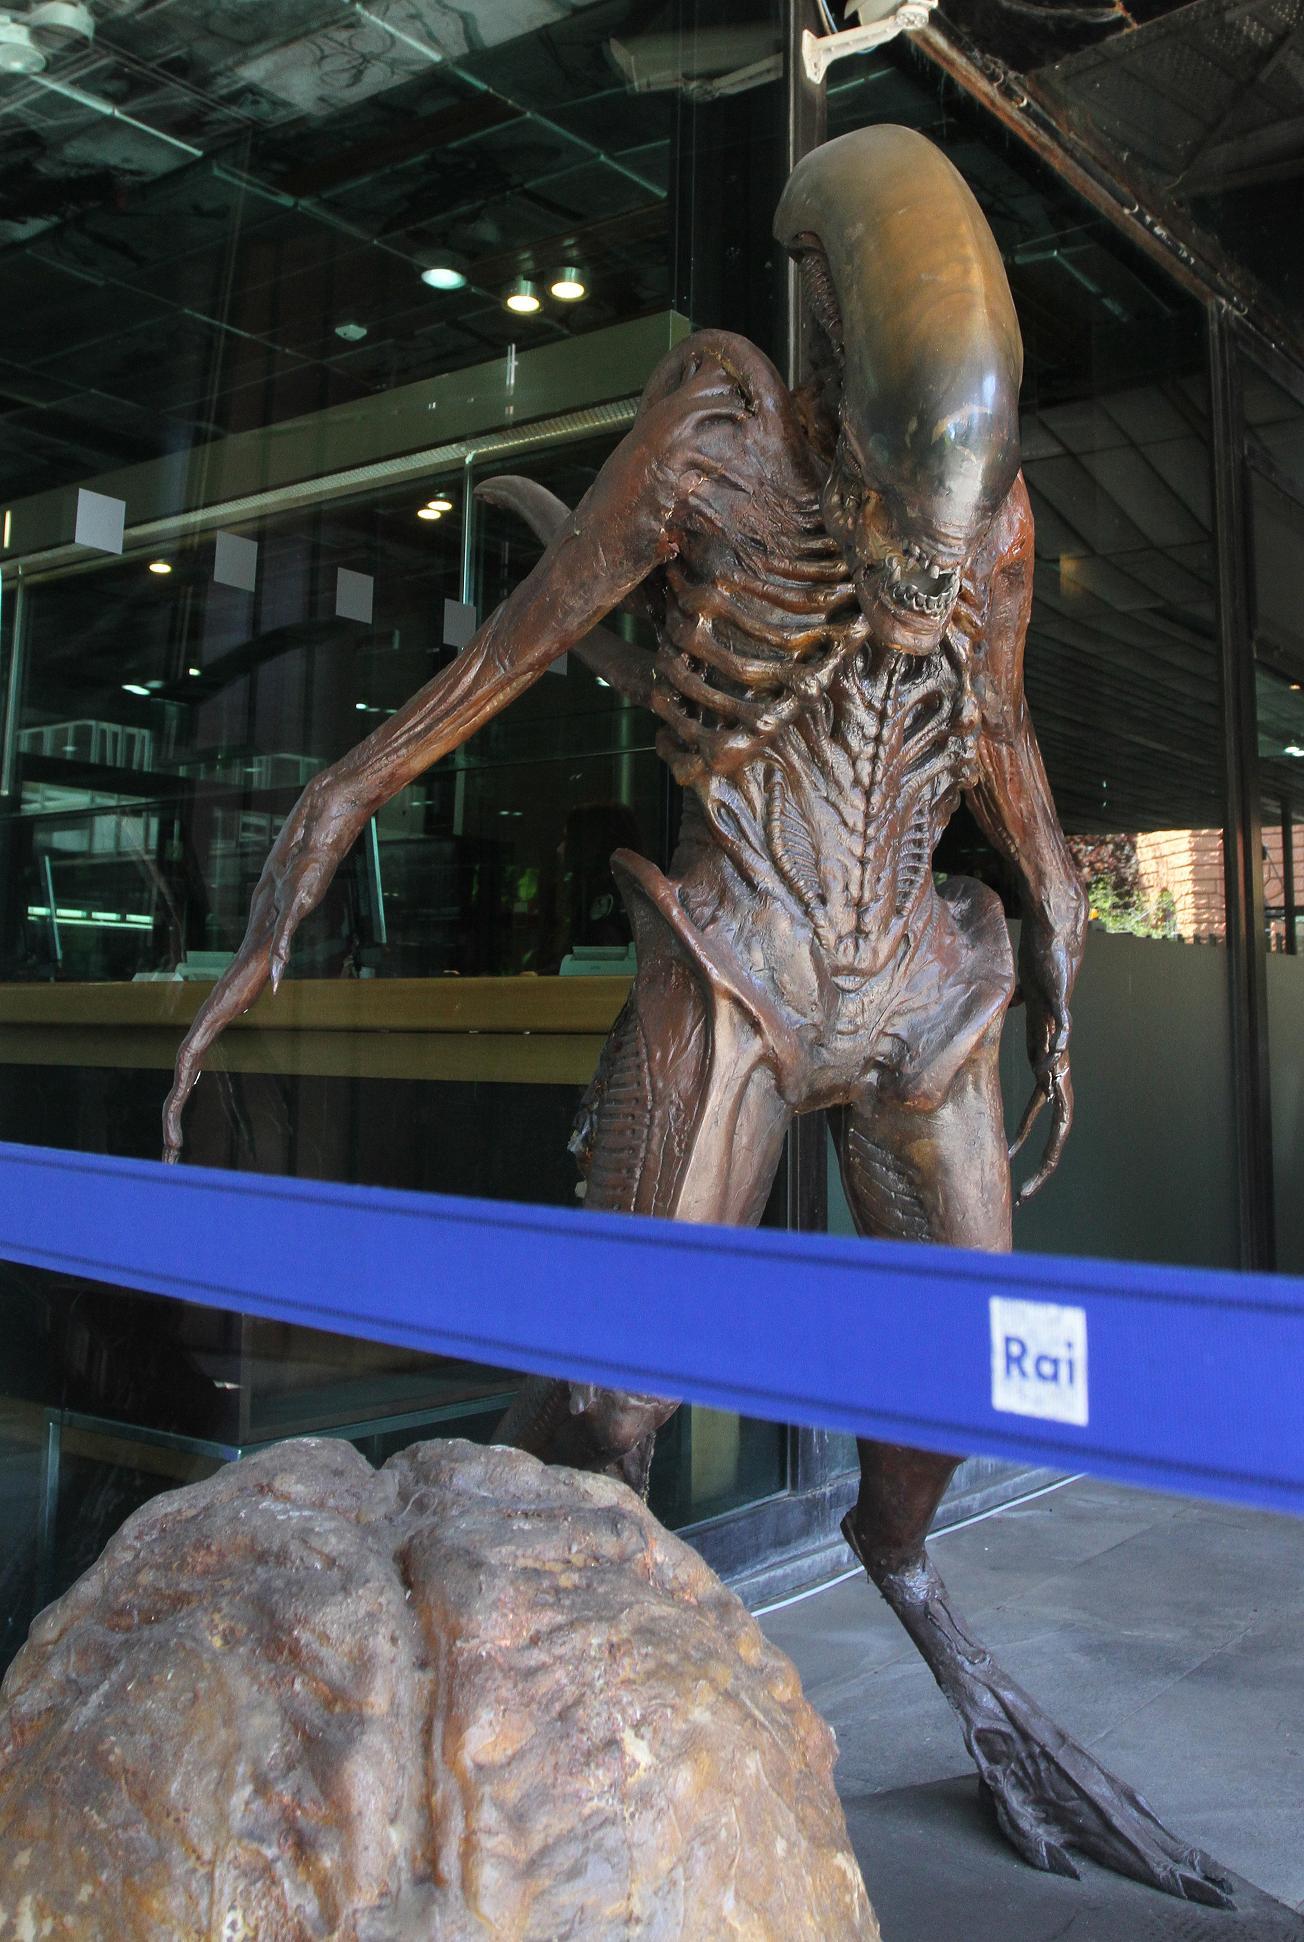 Link a Statua Alien Rai7